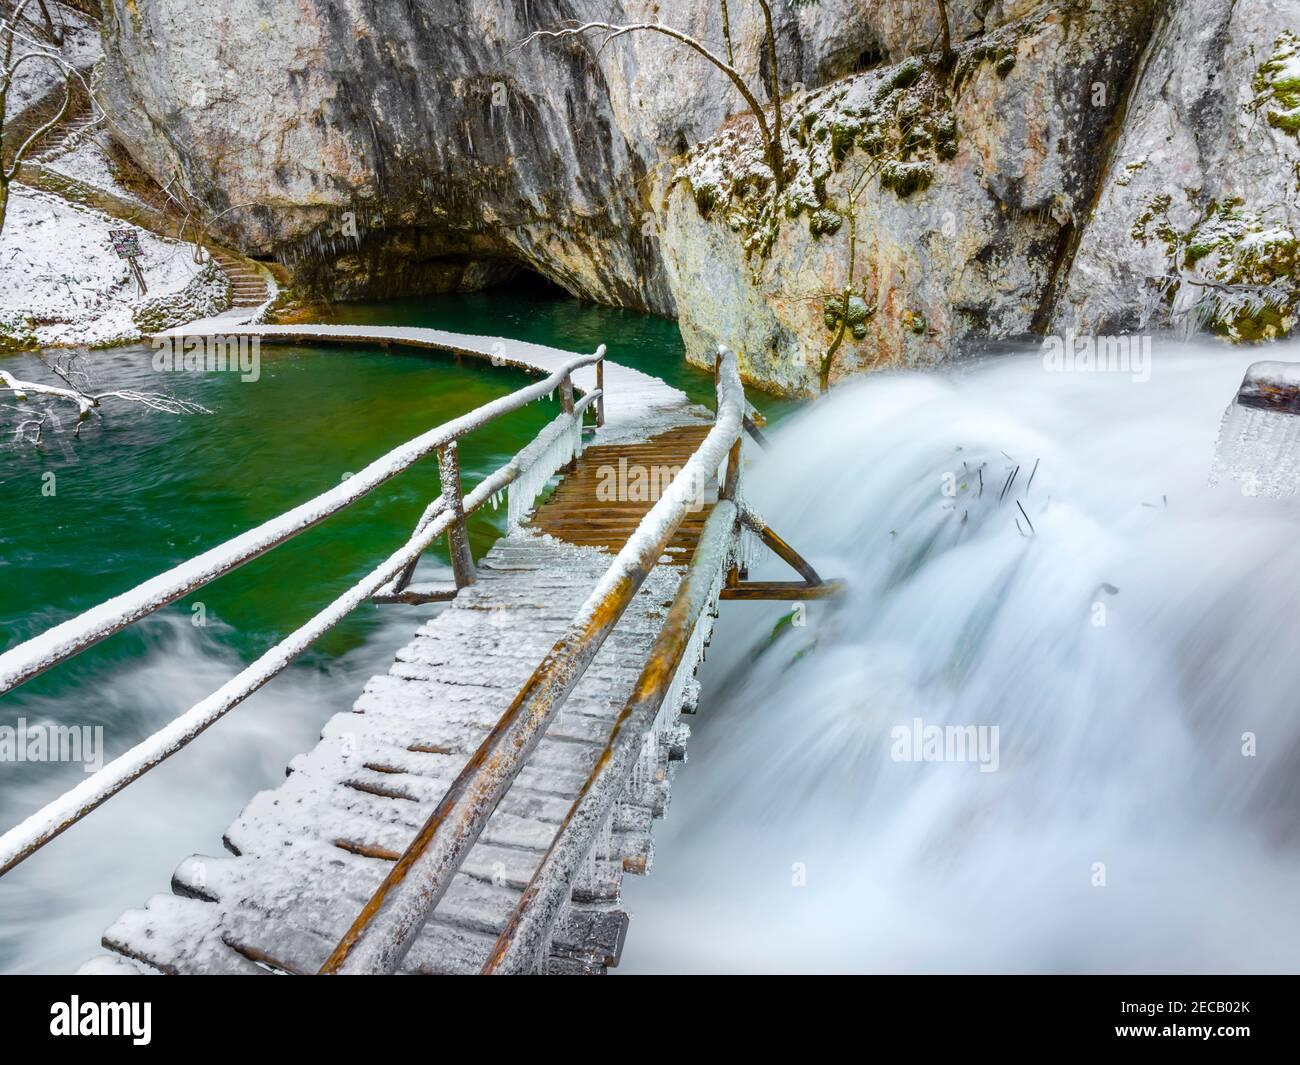 Massive water flow Plitvice lakes Croatia Europe Winter under covered cover snow ice waterflow water flowing flow overwater bridge footbridge Stock Photo